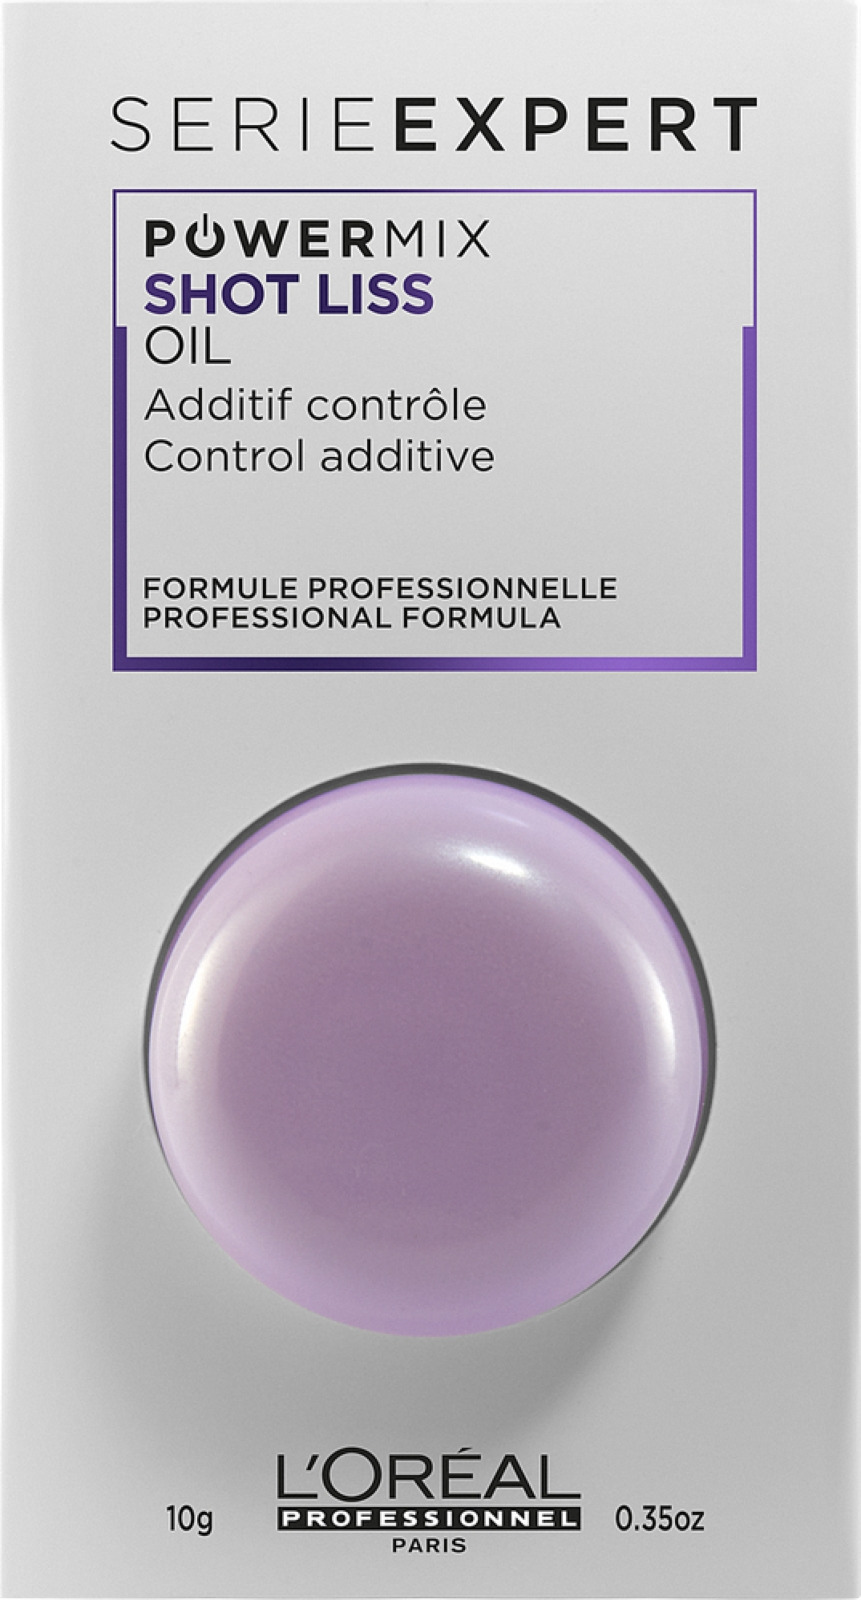 Шот для волос L'Oreal Professionnel Serie Expert Liss Unlimited, для непослушных волос, 10 мл шампуни шот для волос